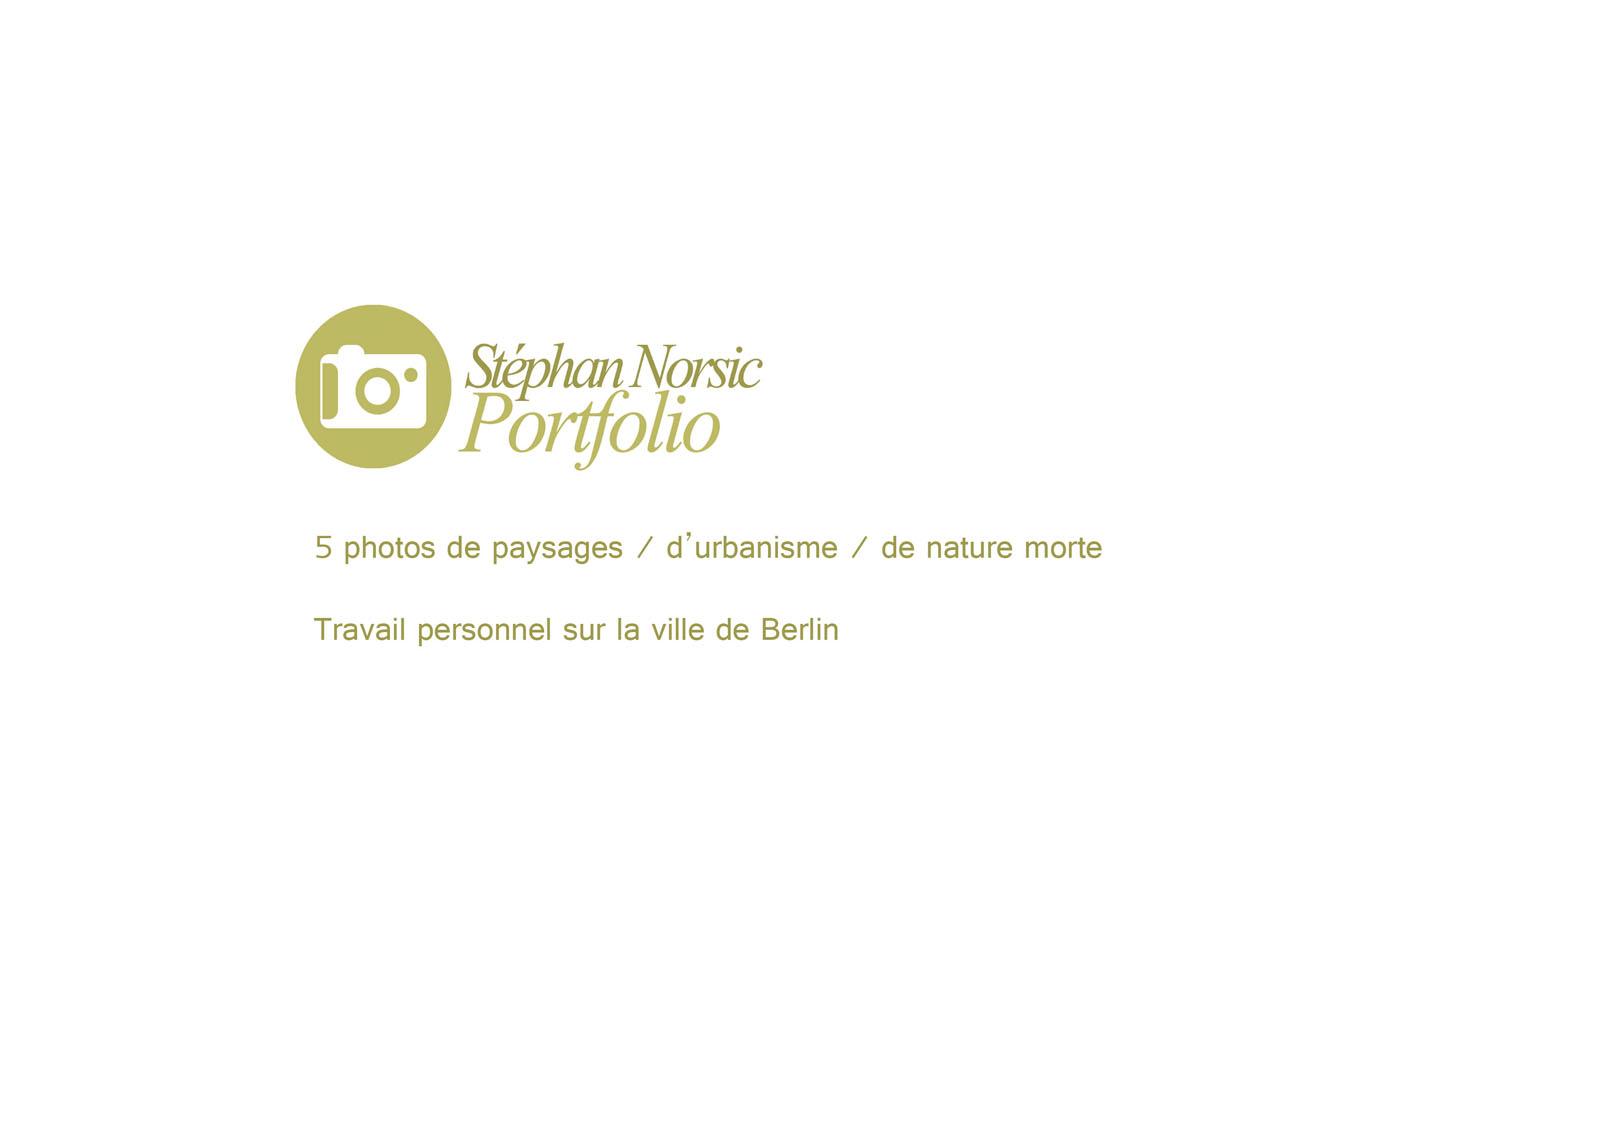 005-Norsic-urbanisme-001